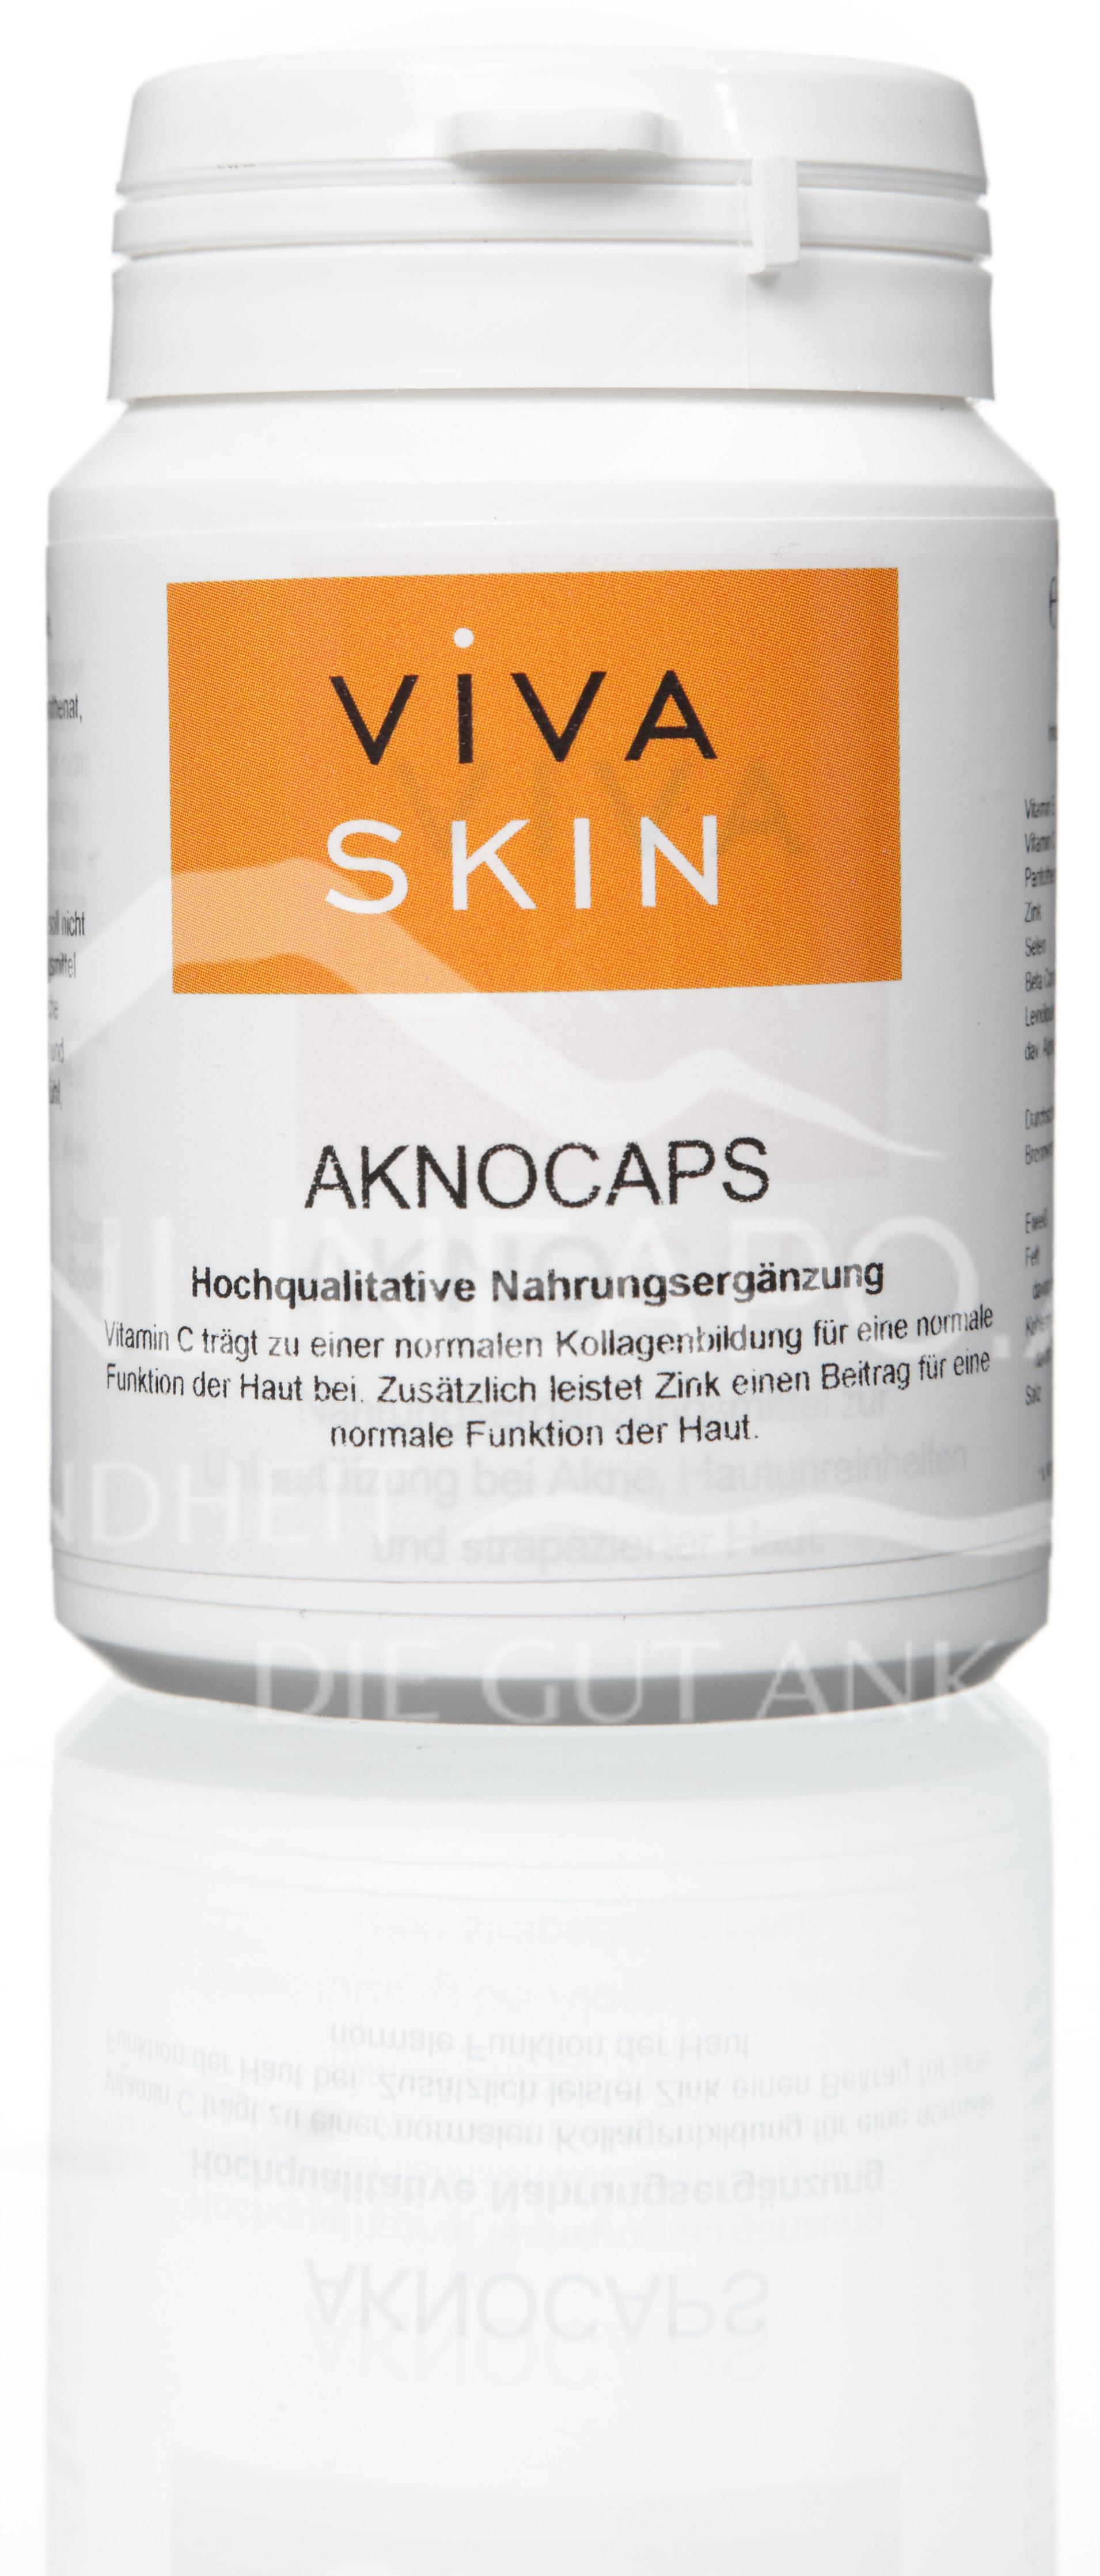 Viva Skin Schöne Haut Caps (AknoCaps) Kapseln